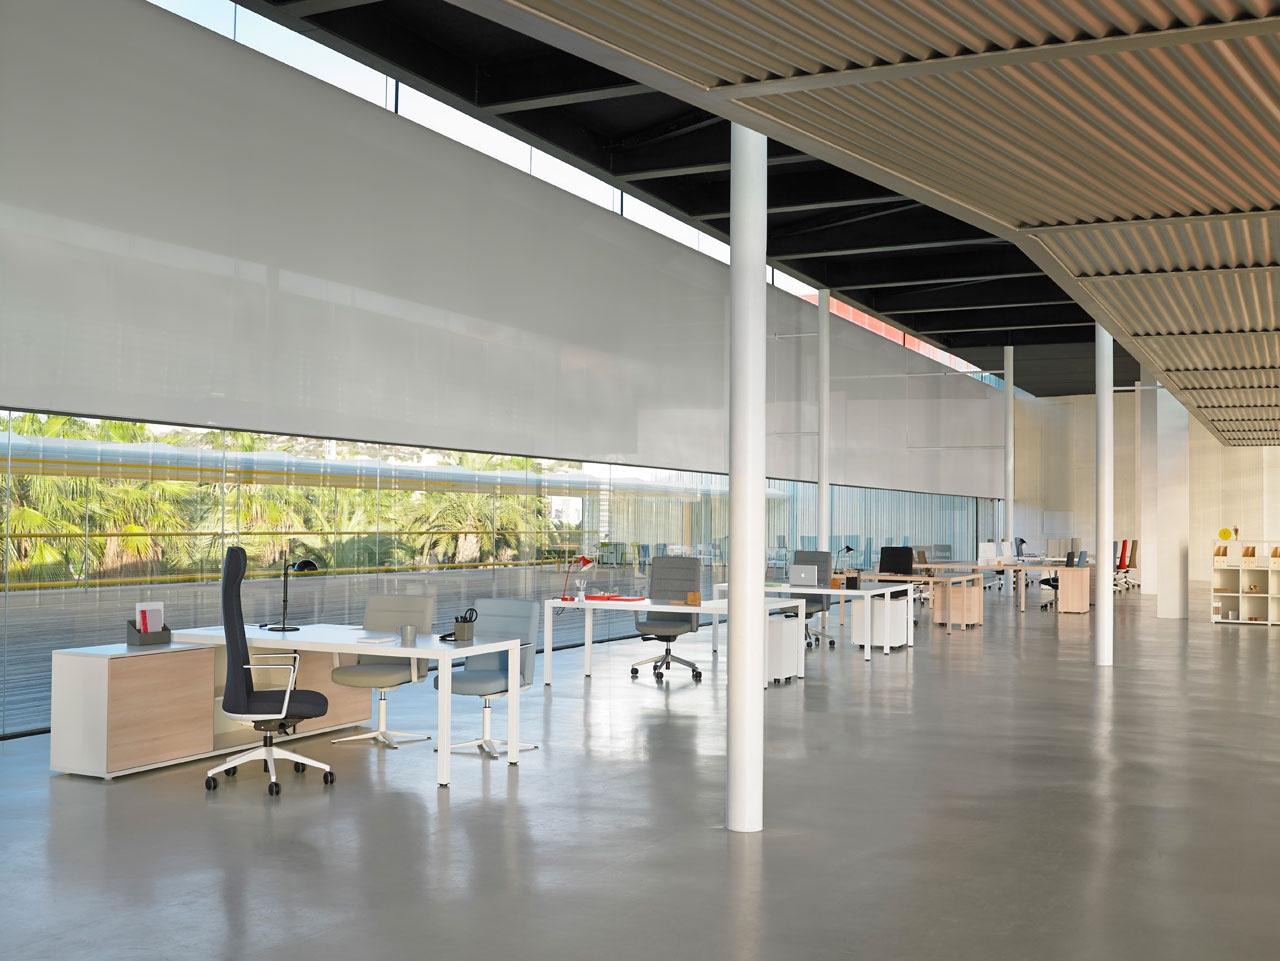 Prisma desk by designers Sylvain Carlet & Isern Serra.